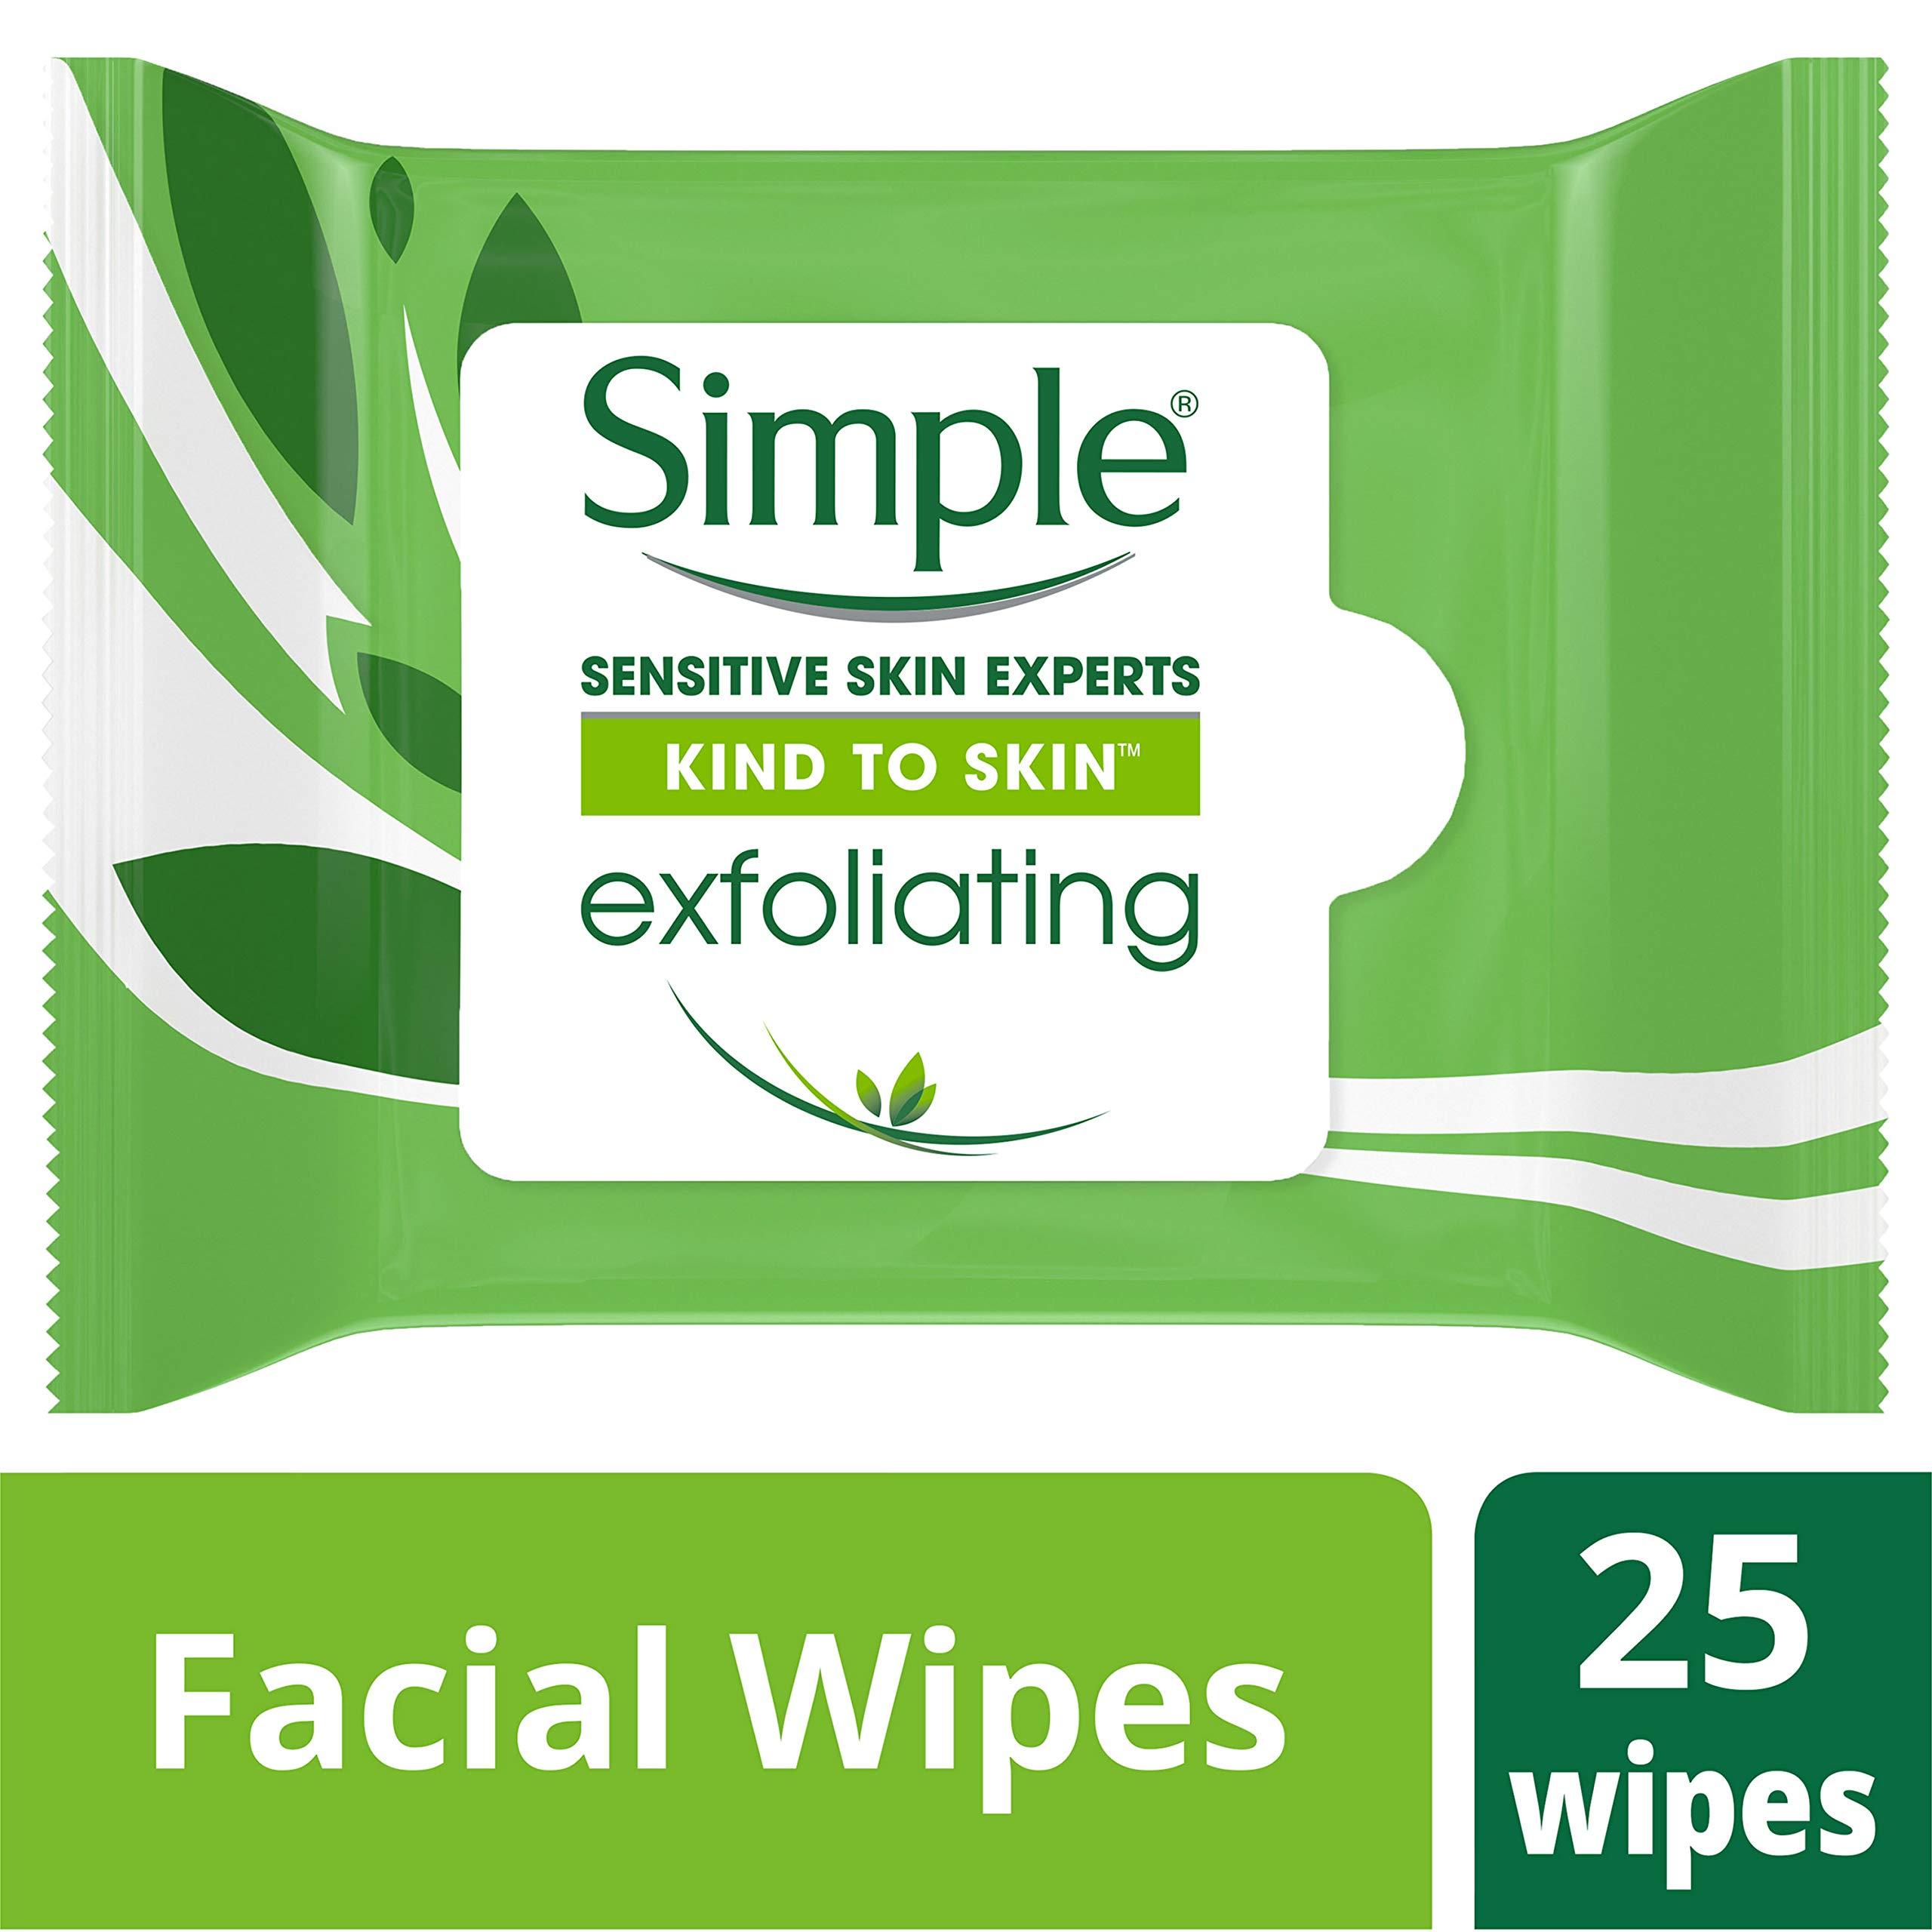 Simple Exfoliating Wipes, 25 Count